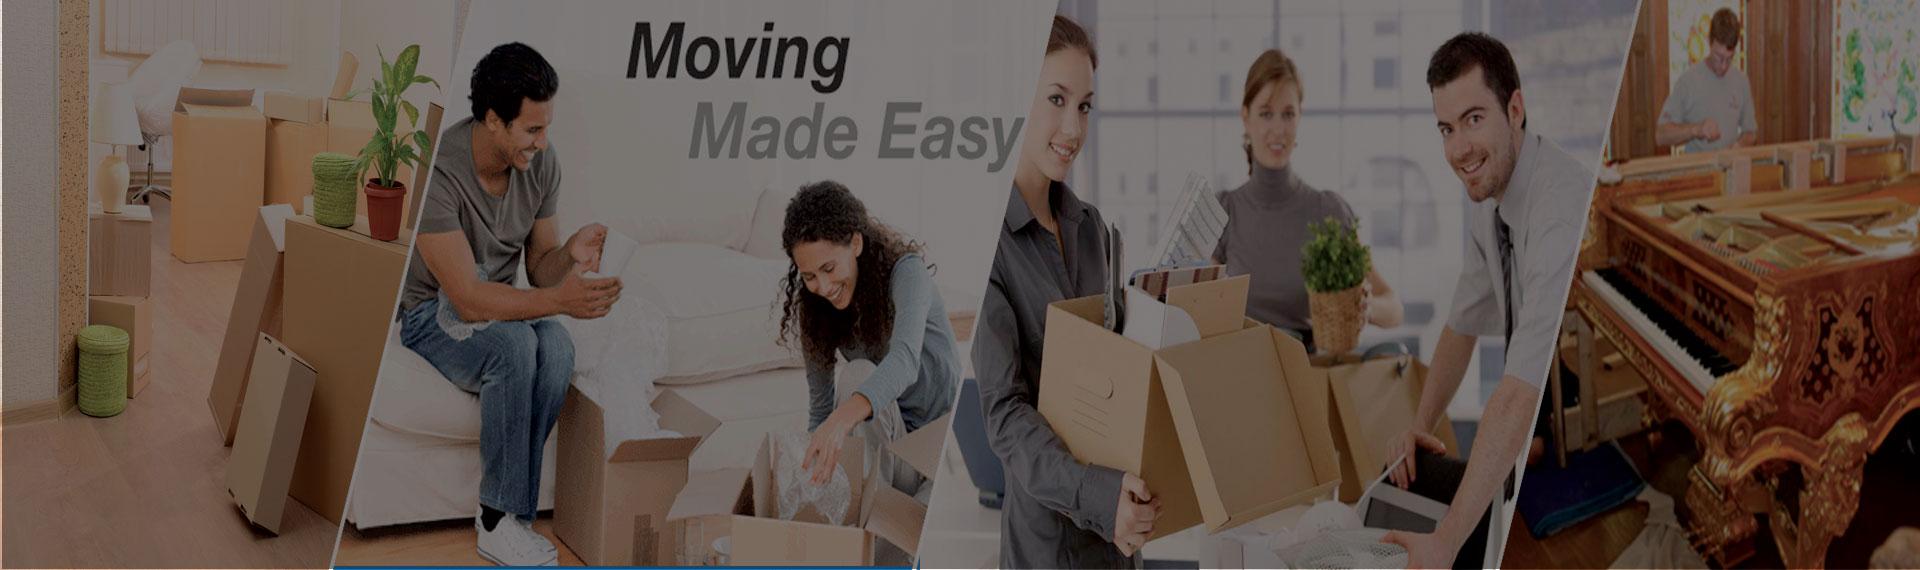 JV Moving Corp Bayonne NJ